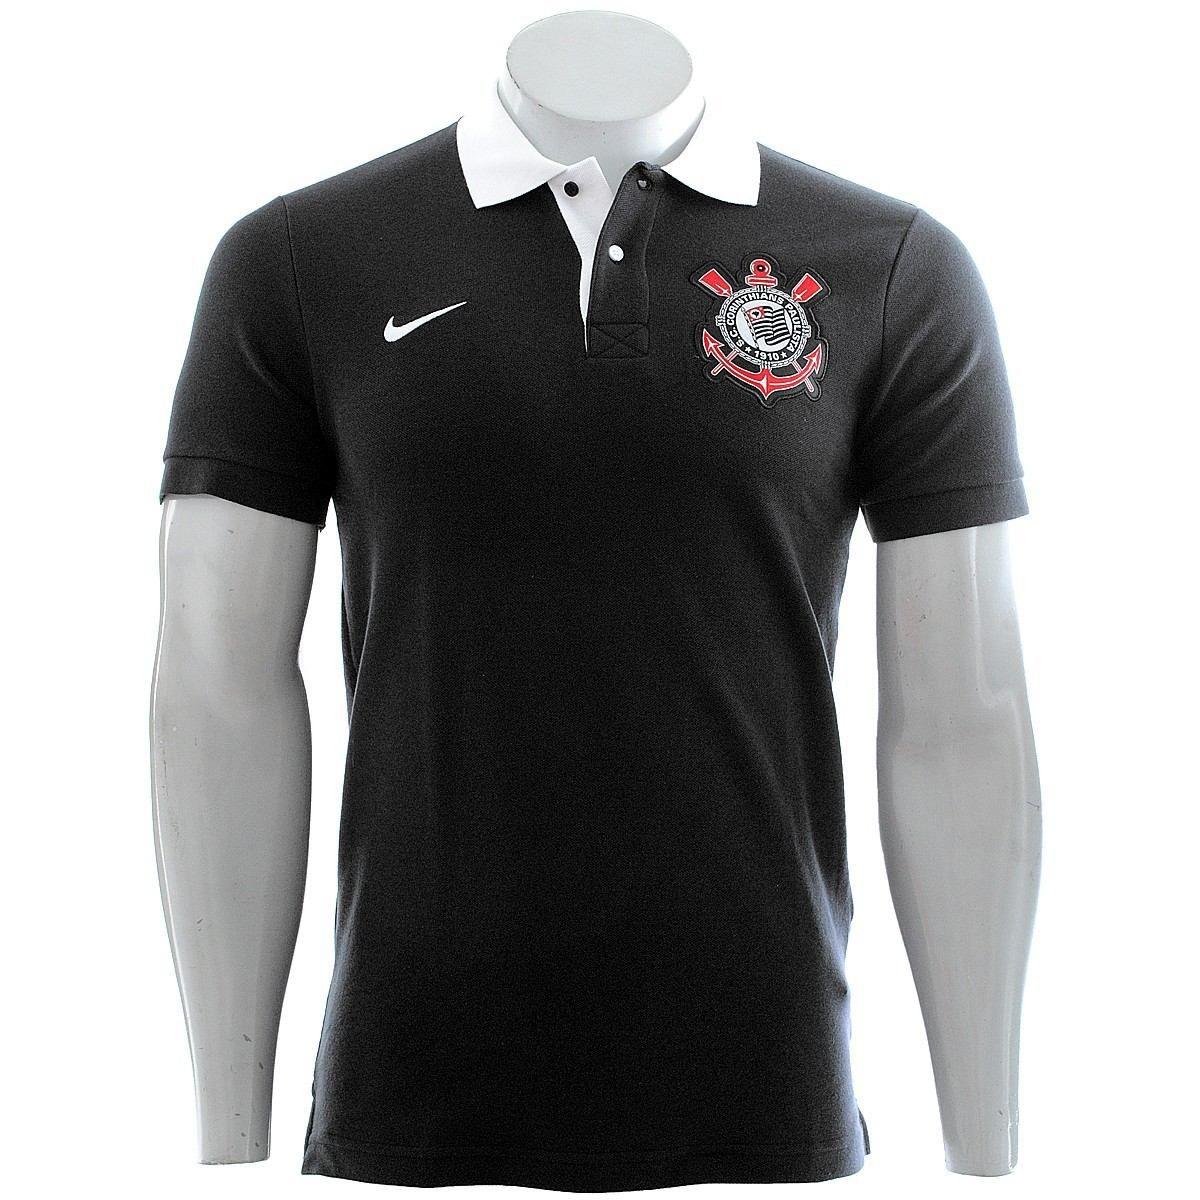 0753fc8f6d Camisa Polo Corinthians Nike Core Matchup Preta - Promoção - SPORT ...